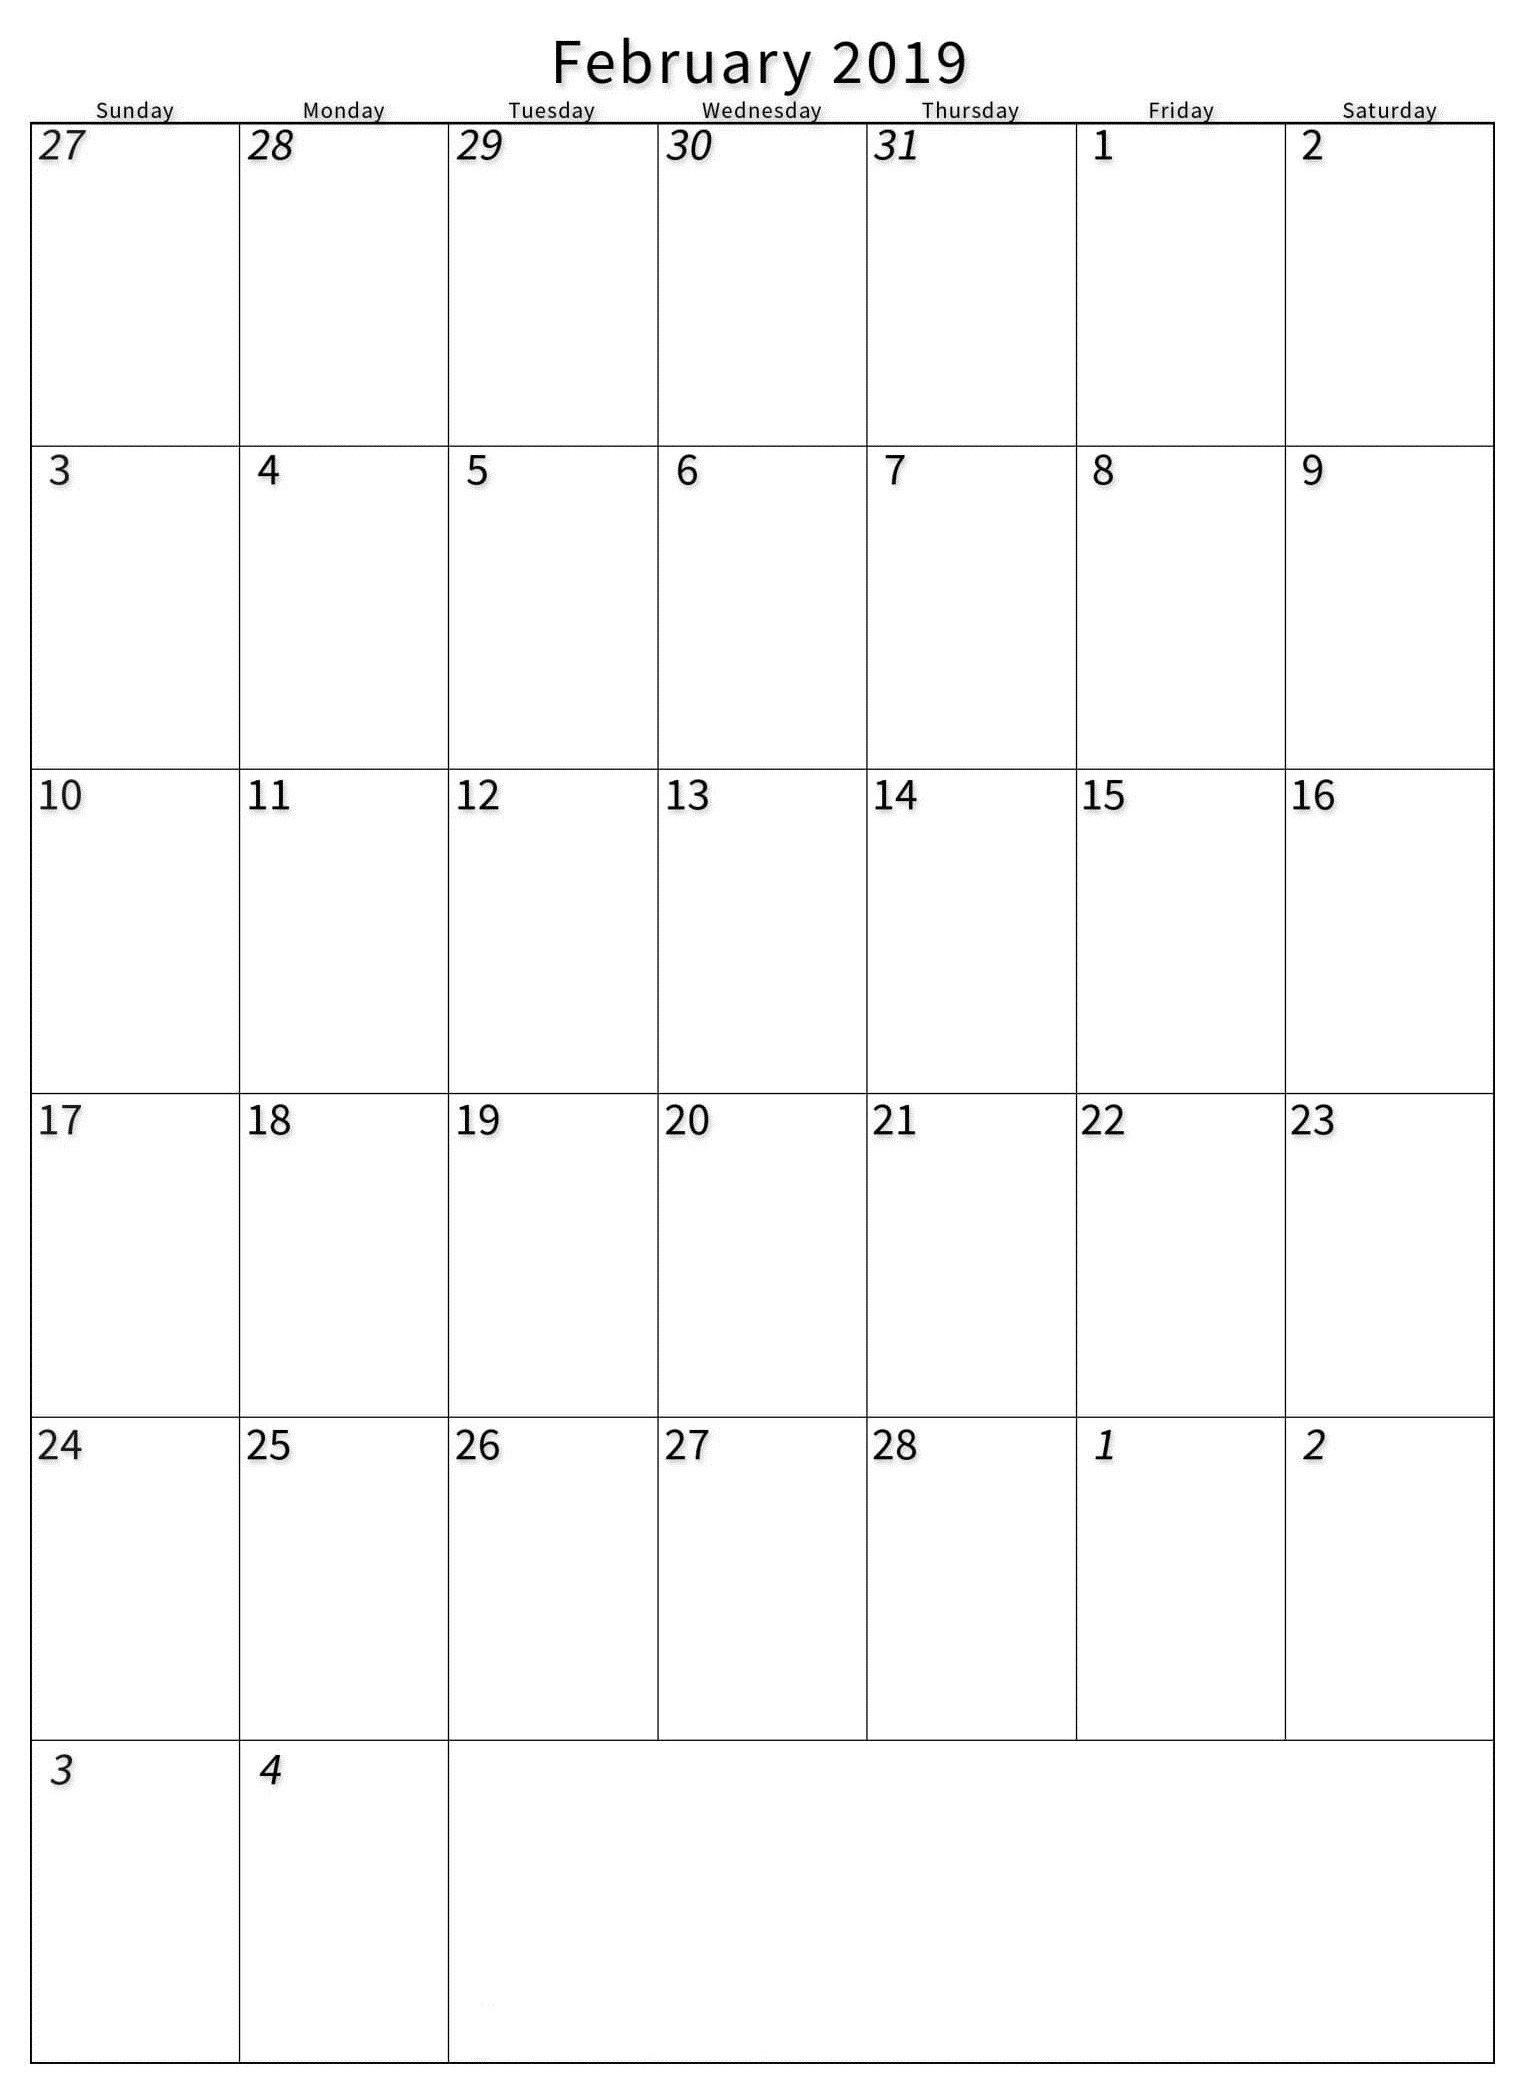 February 2019 Portrait Calendar Template - Printable Calendar Templates Calendar 2019 Portrait